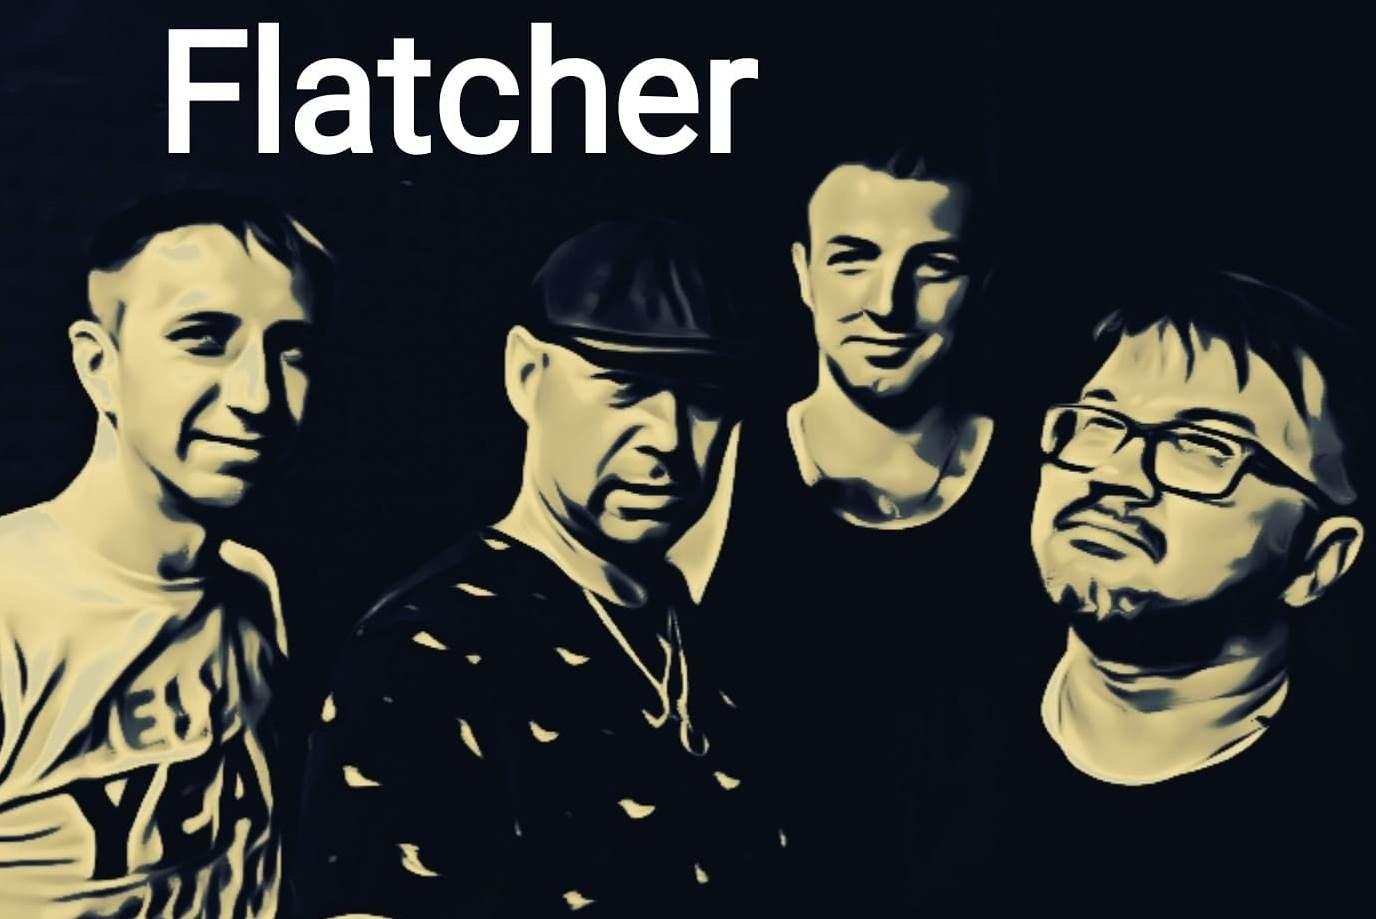 Flatcher